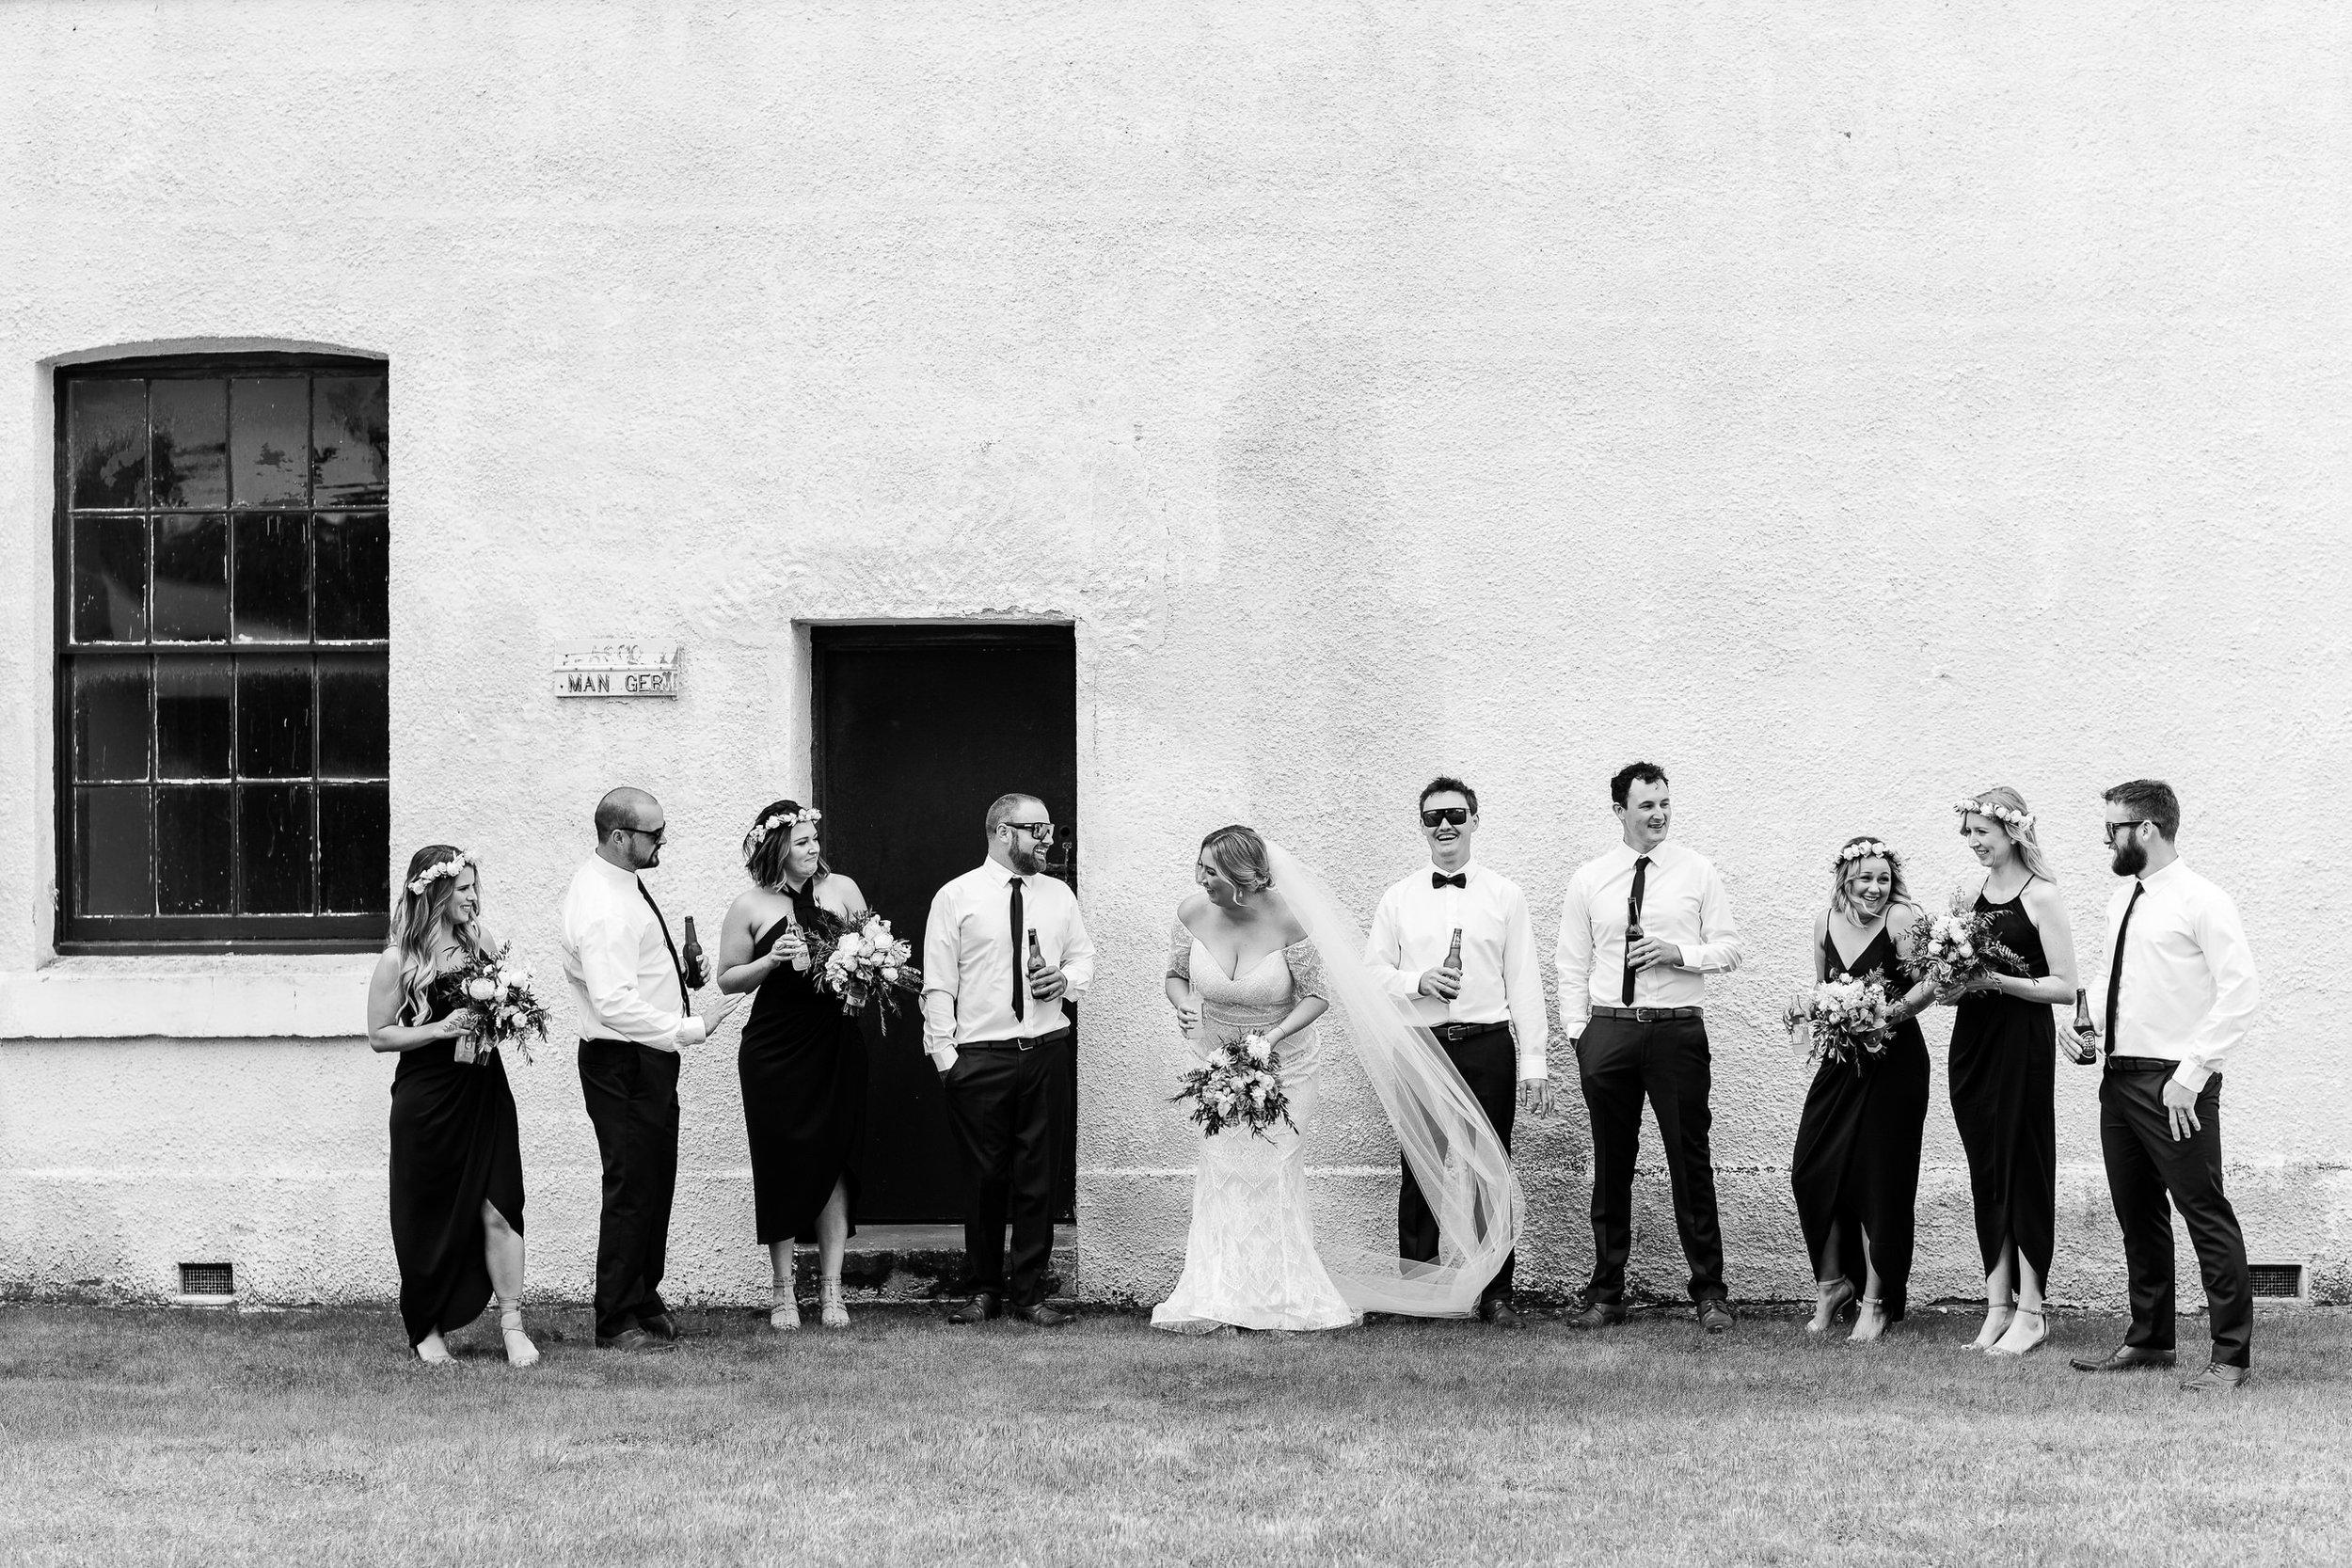 Justin_And_Jim_Photography_Portsea_Pub_Wedding41.JPG